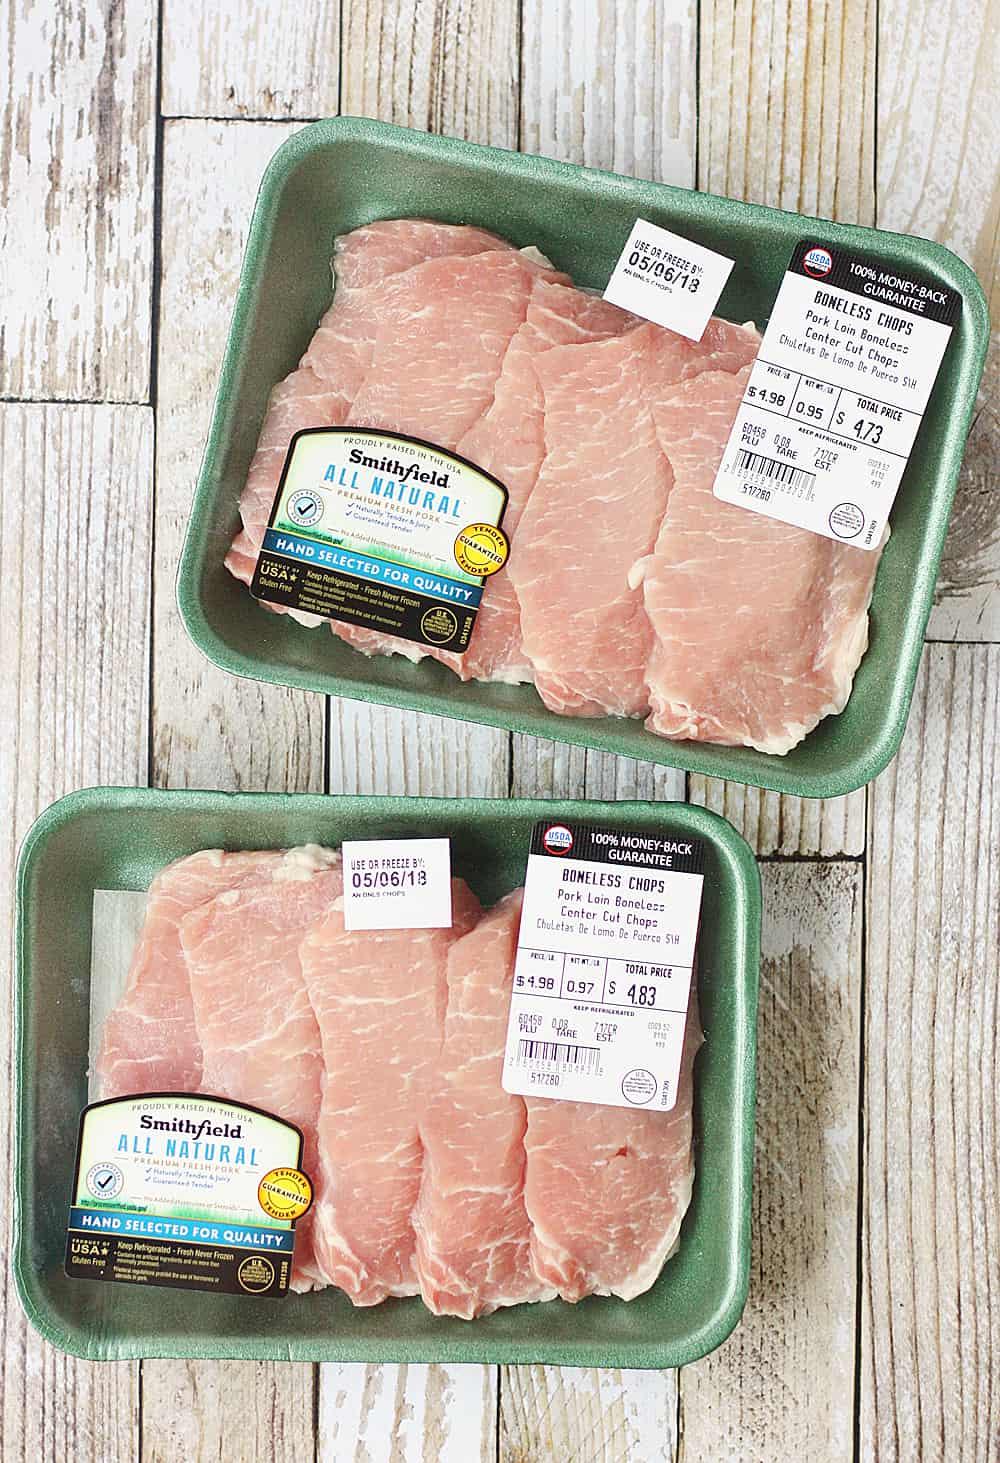 Smithfield All Natural Fresh Pork